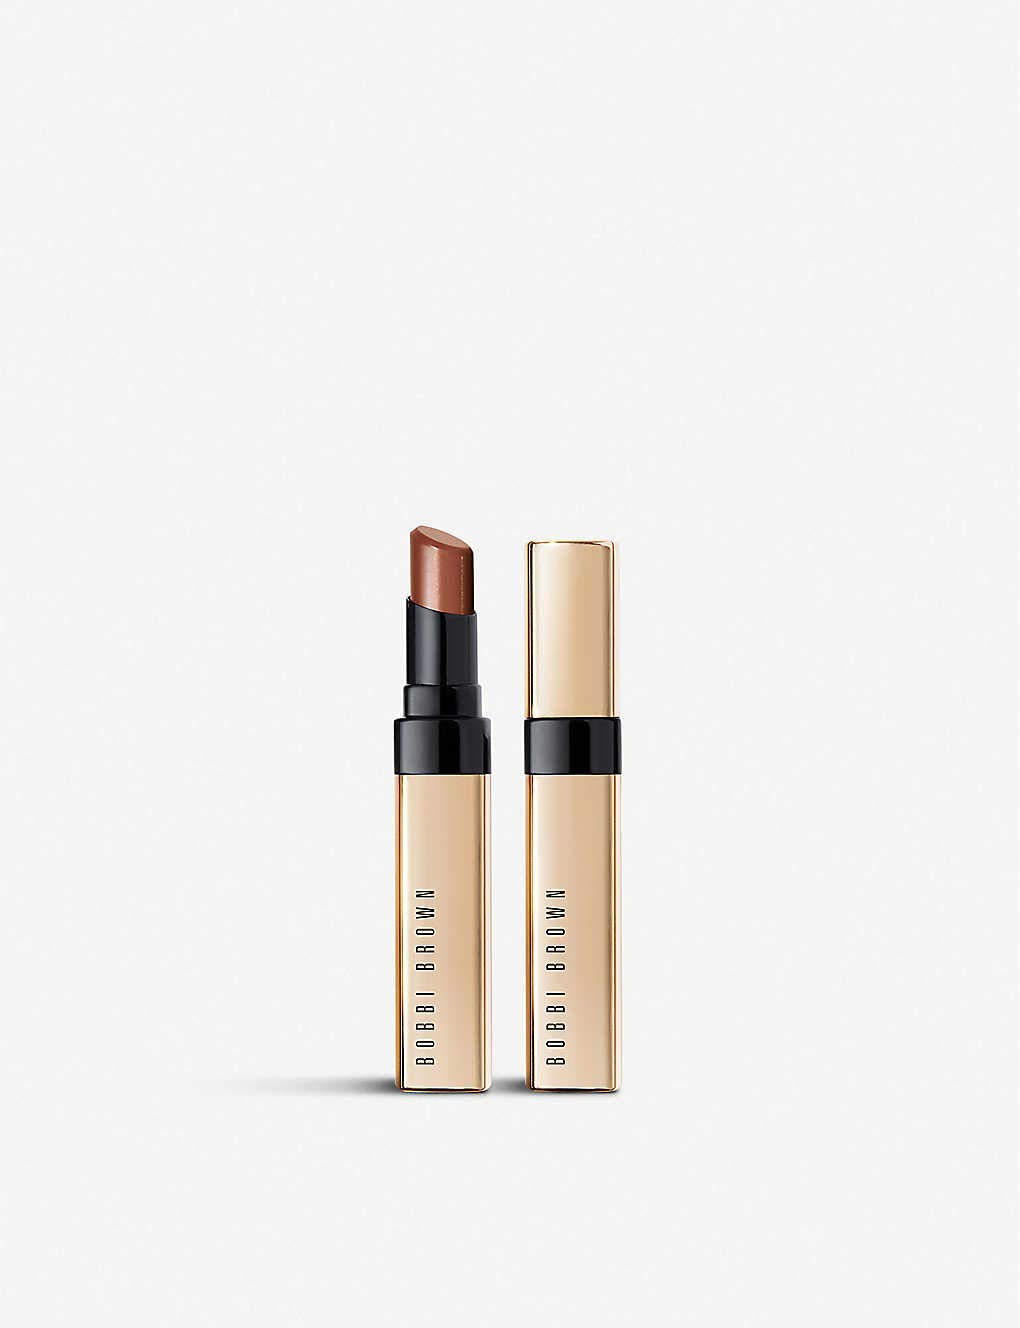 Bobbi Brown famous Gorgeous Luxe Shine Intense - Honey Lipstick Bold